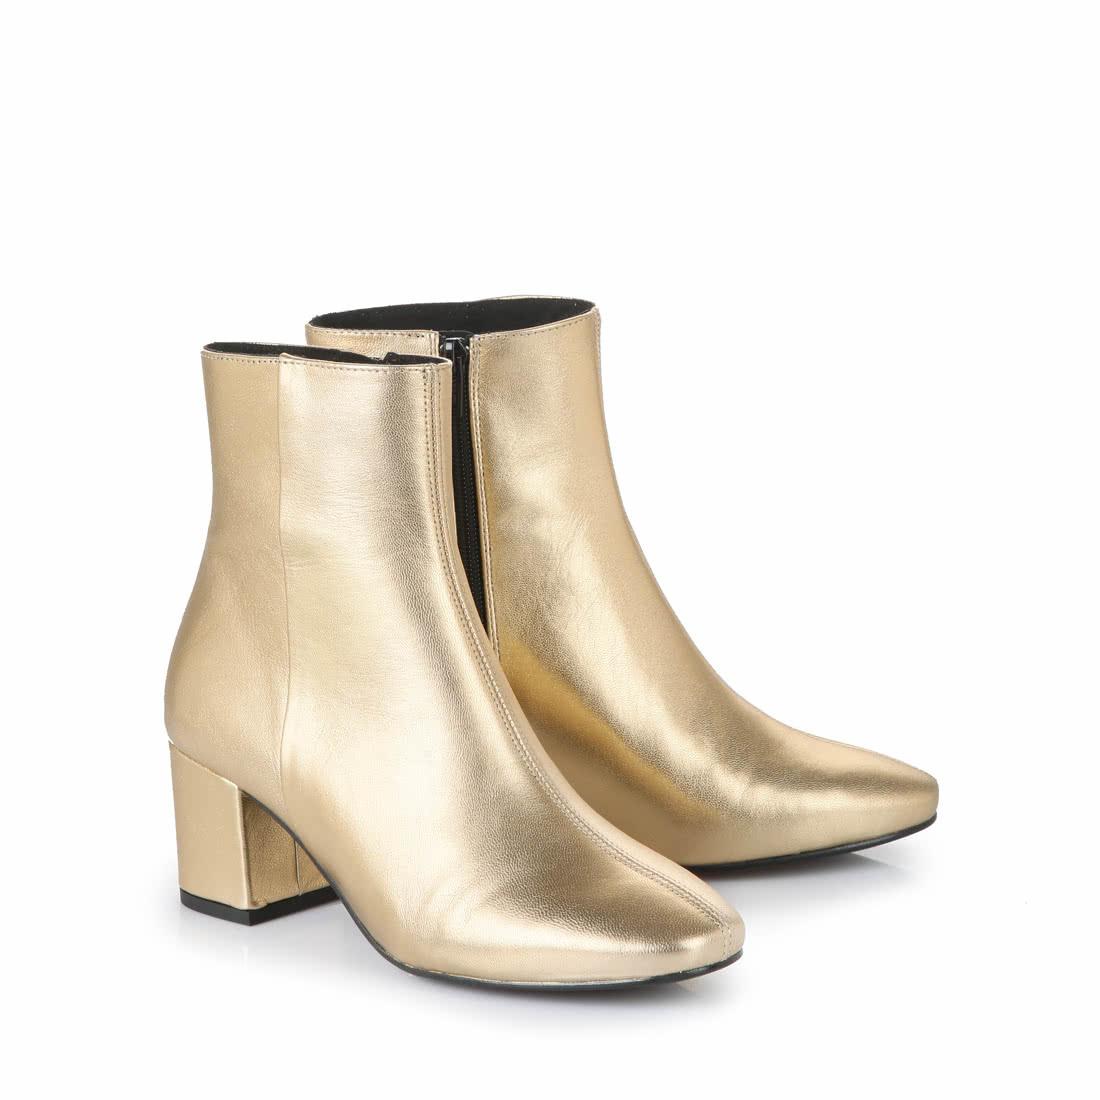 buffalo ankle boots in metallic gold buy online in buffalo online shop buffalo. Black Bedroom Furniture Sets. Home Design Ideas